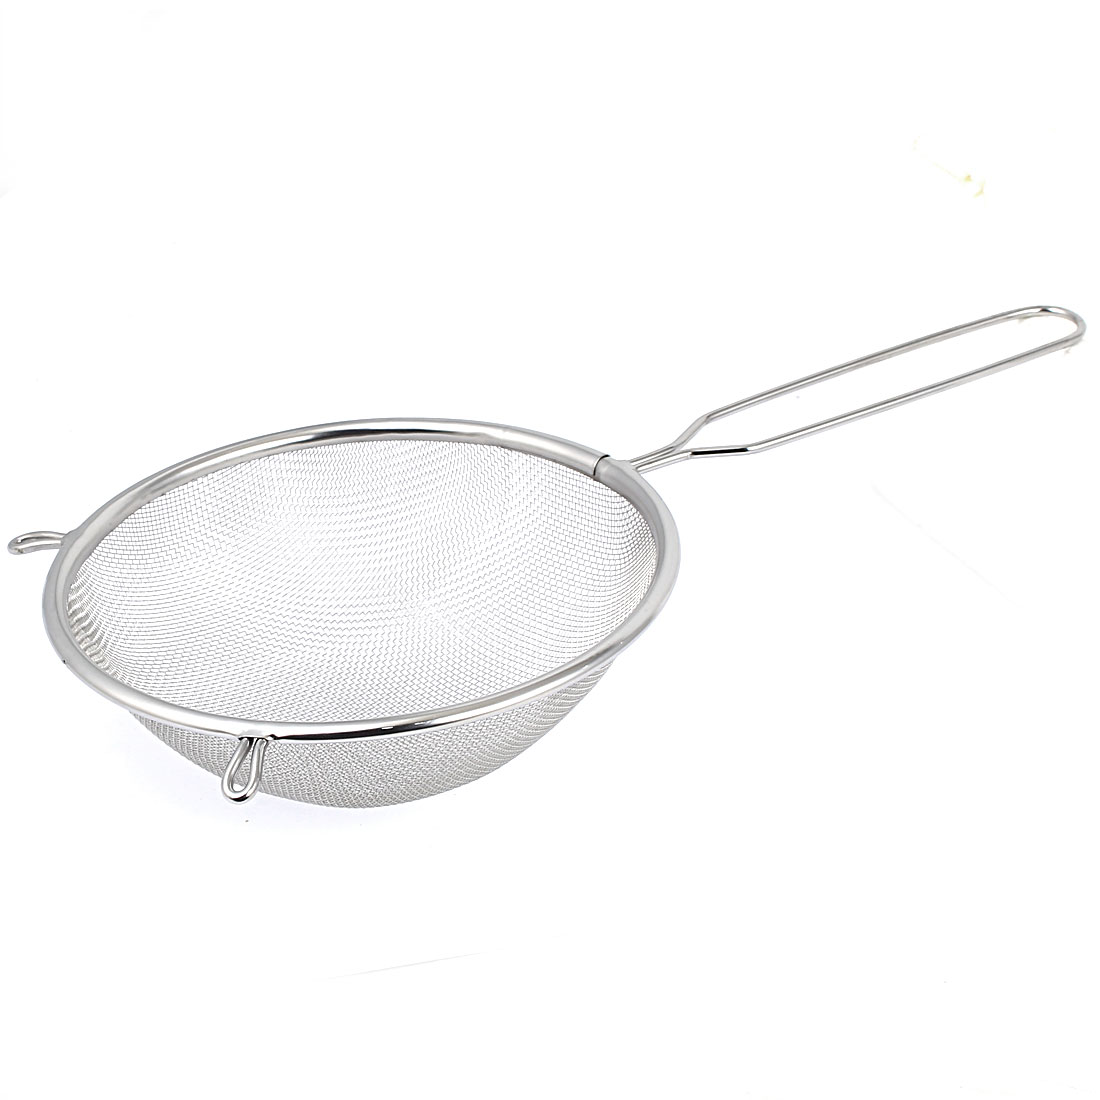 "6.3"" Dia Home Kitchen Stainless Steel Fine Mesh Wire Flour Colander Sifter Sieve Oil Strainer by"